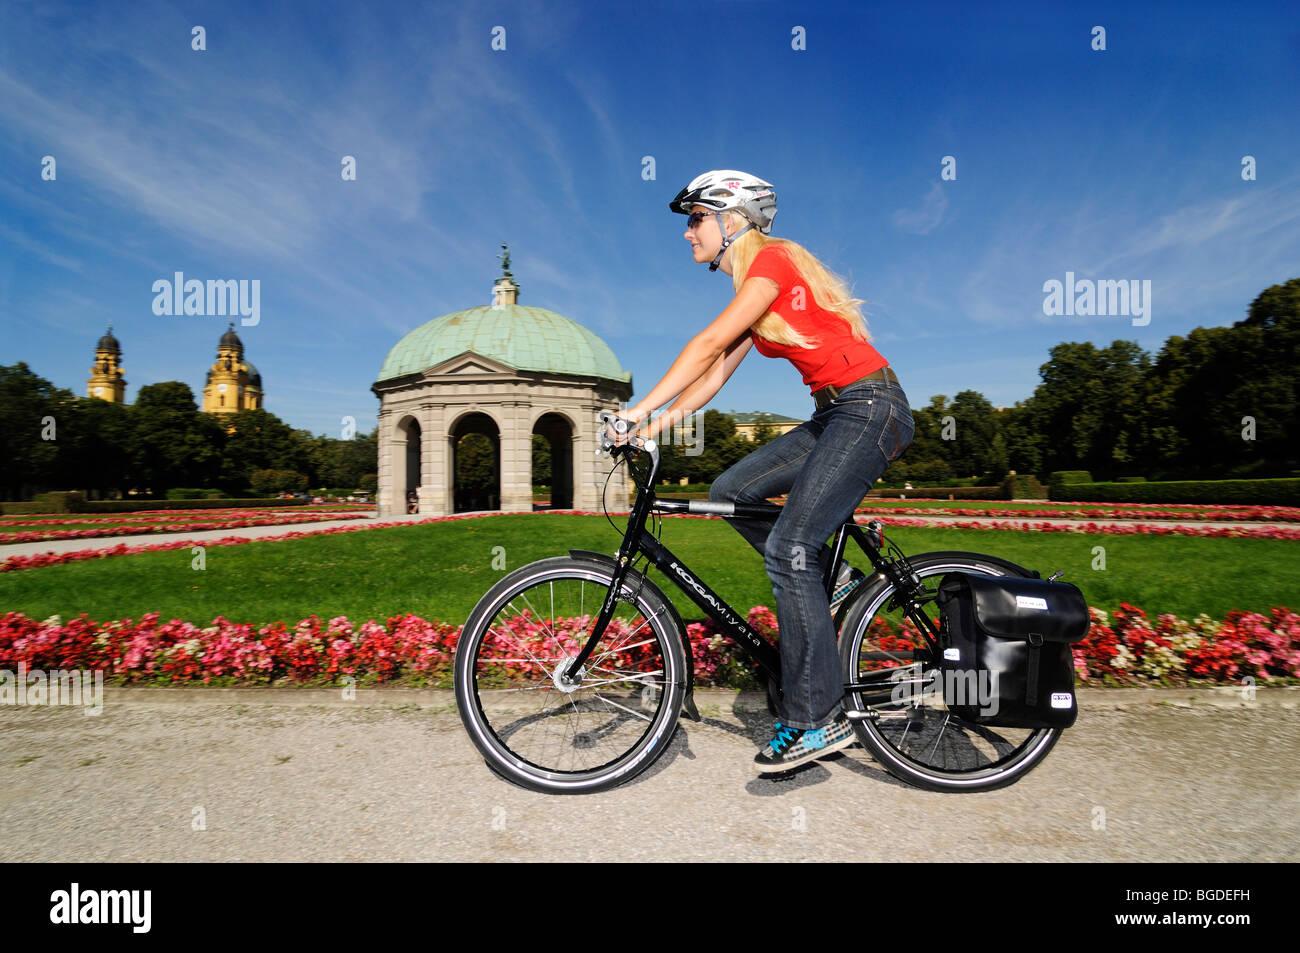 Mujer joven montar bicicleta, Hofgarten, Jardín, Munich, Baviera, Alemania, Europa Foto de stock